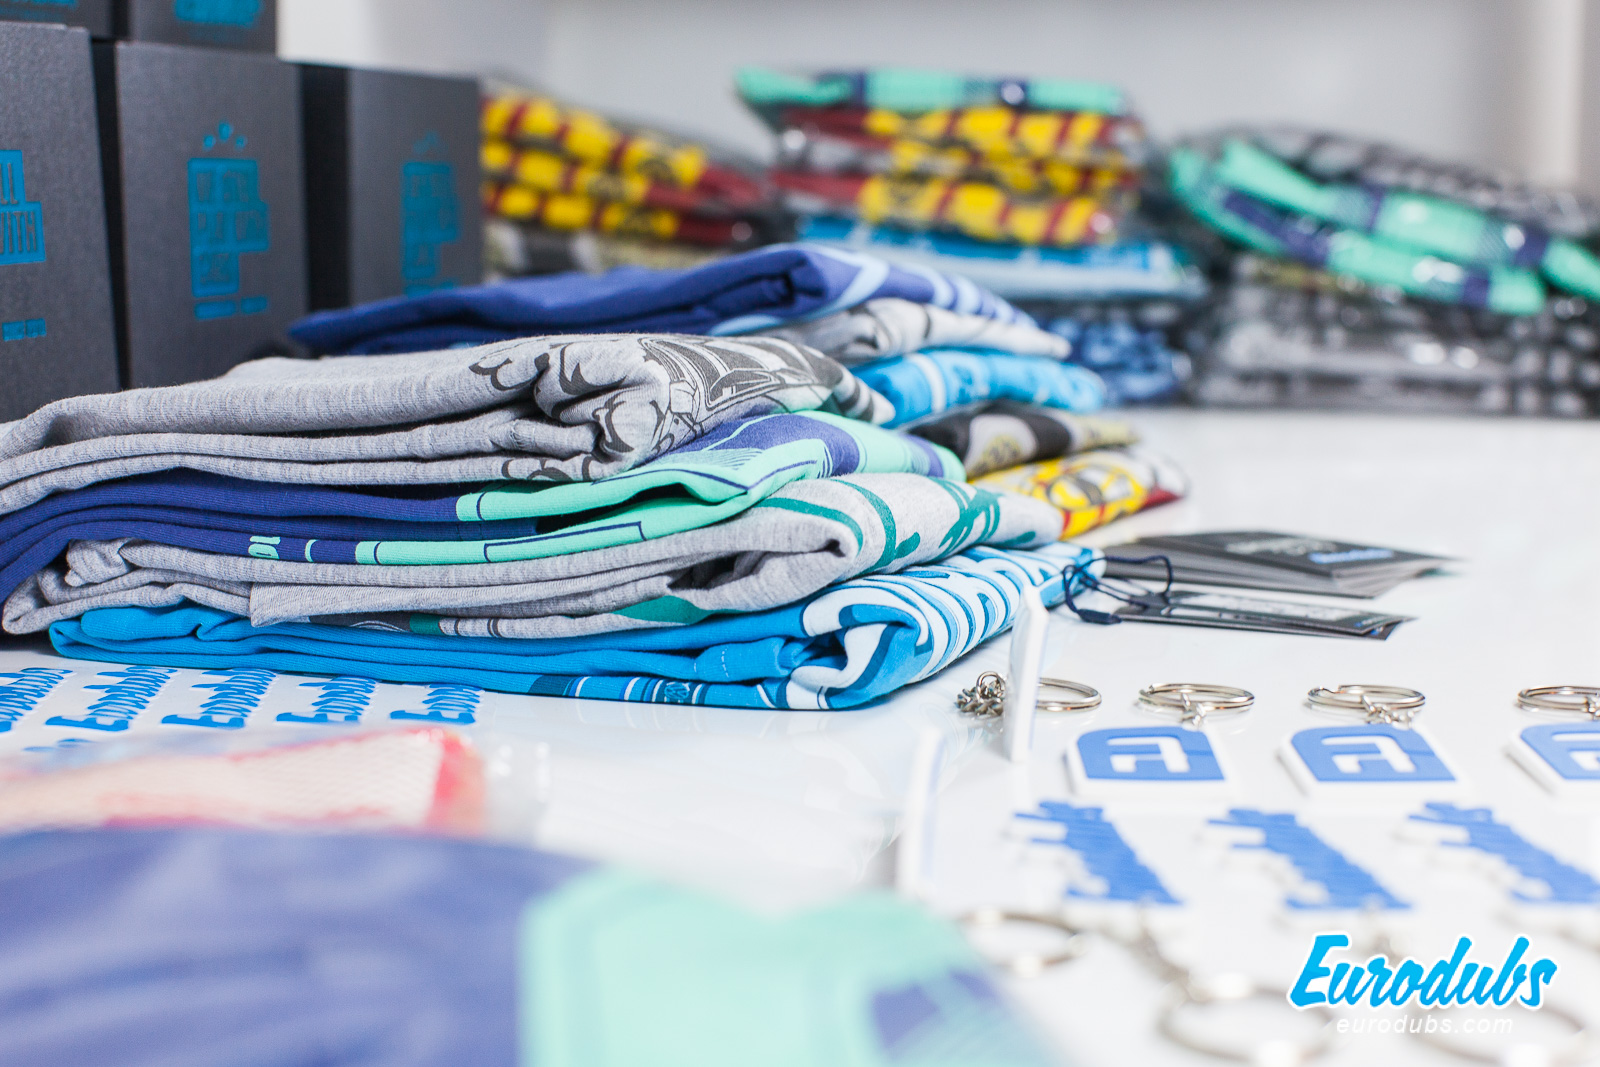 Eurodubs T-shirts - Automotive Apparel